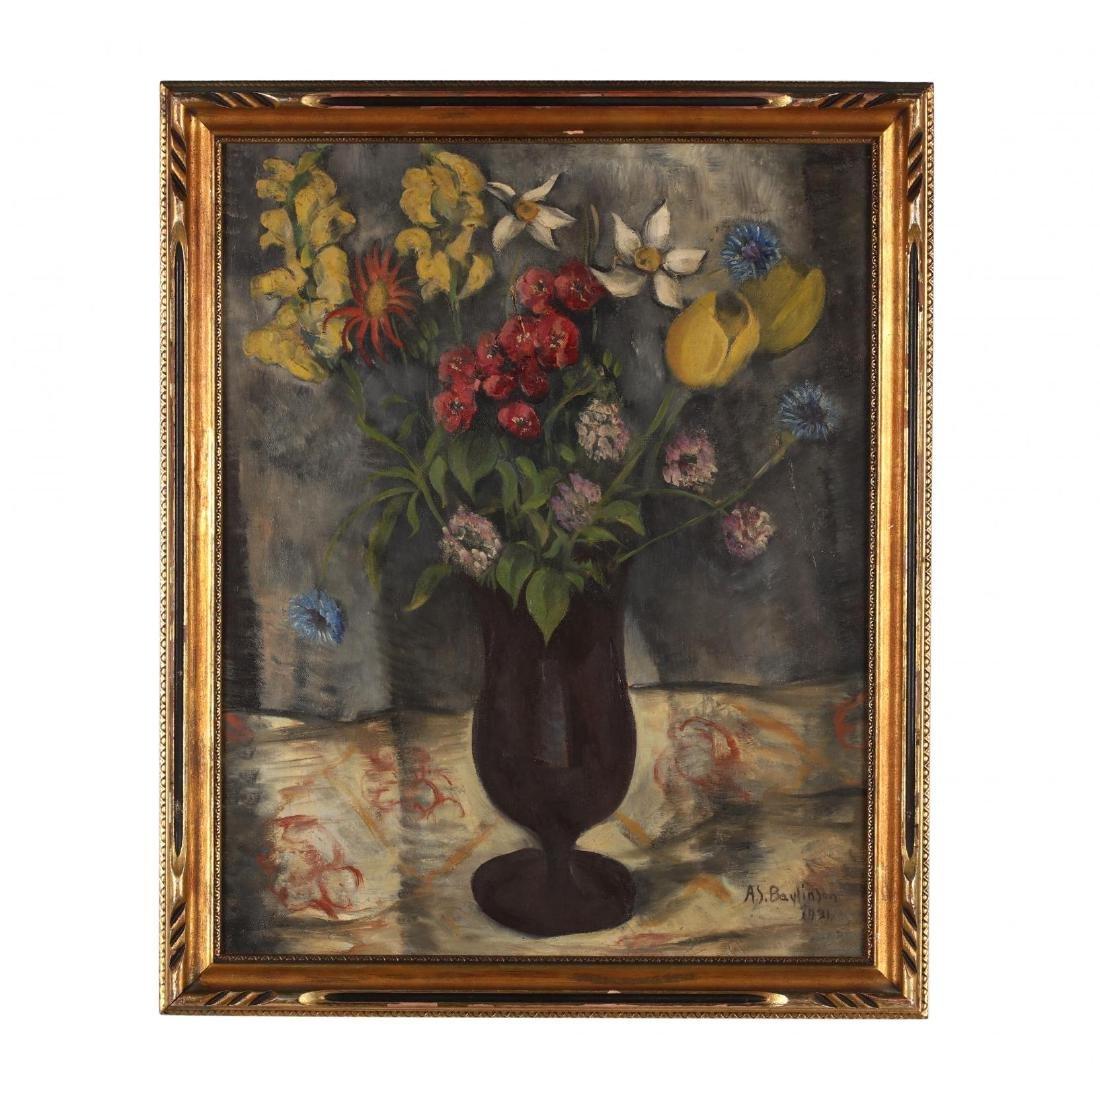 Abraham Soloman Baylinson (1882-1950), Floral Still